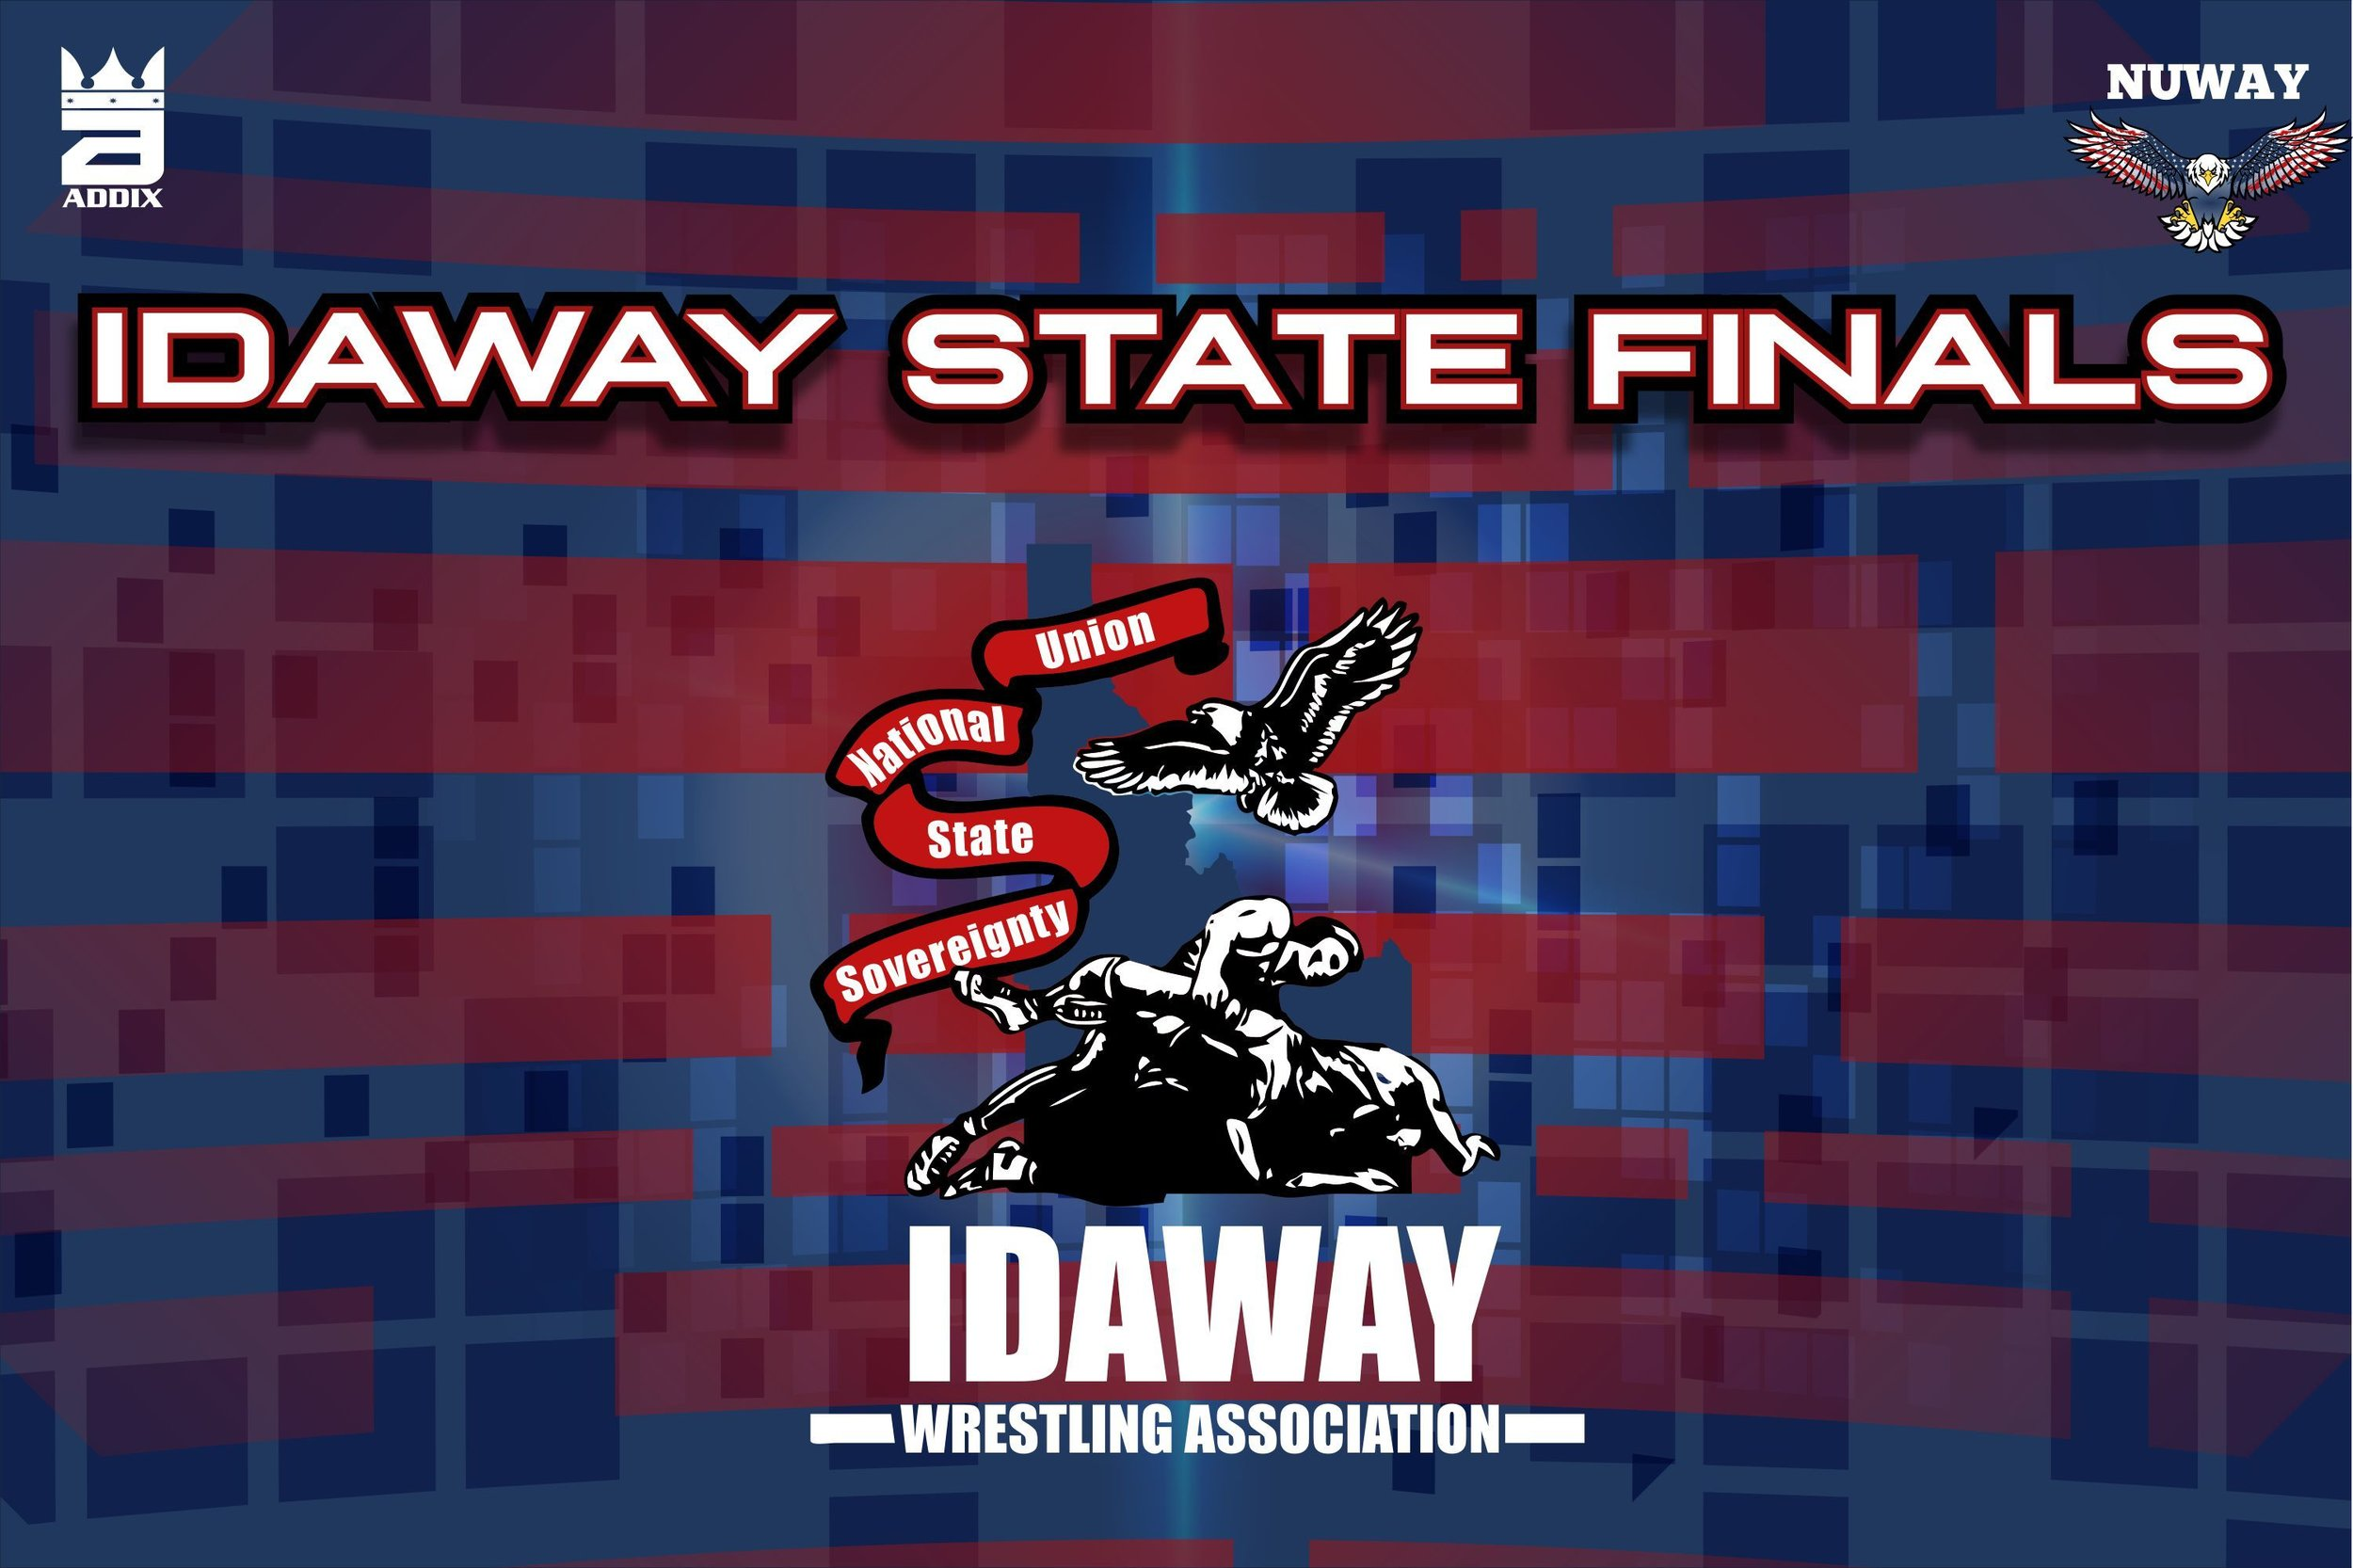 LM_1-19_2017 IDAWAY State Finals Championship_Banner_2.jpg